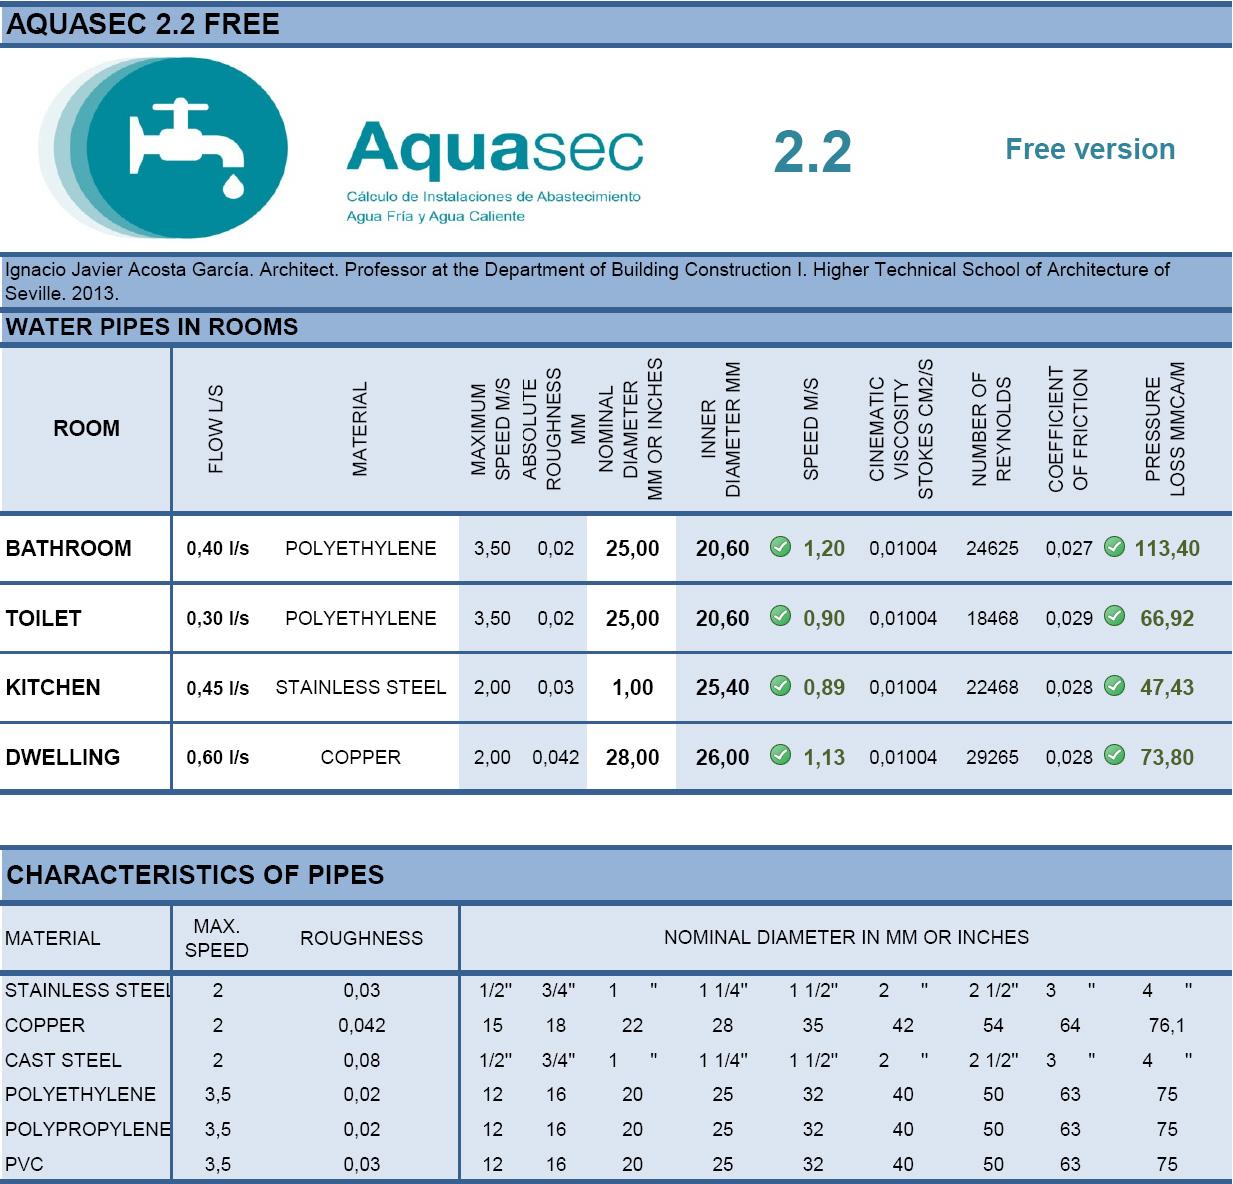 architect apps aquasec 22 free version